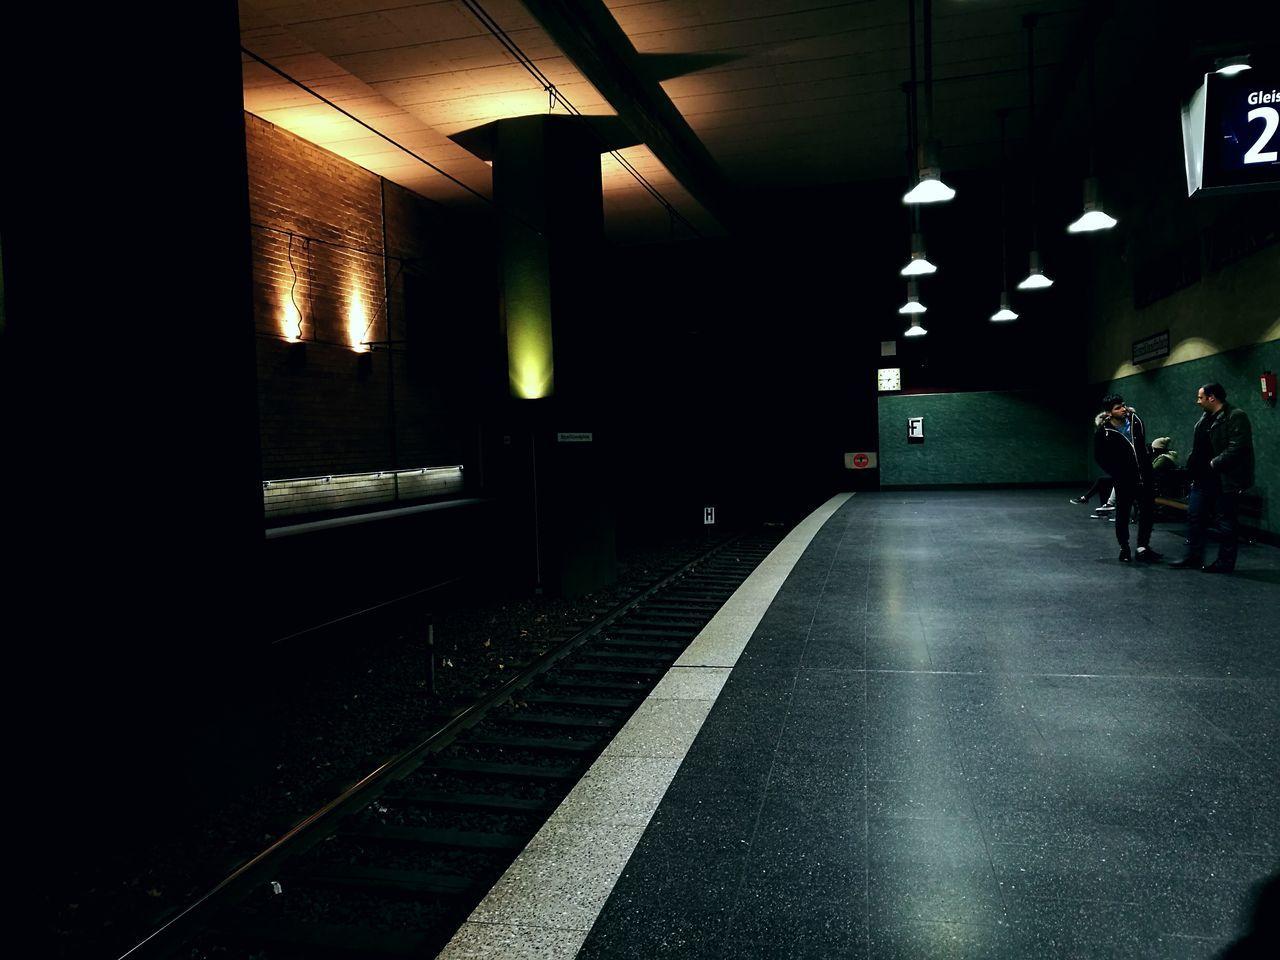 Indoors  Illuminated Architecture City Night Transportation The Way Forward Building Exterior City Life Light Trail Architecture Underground Passage